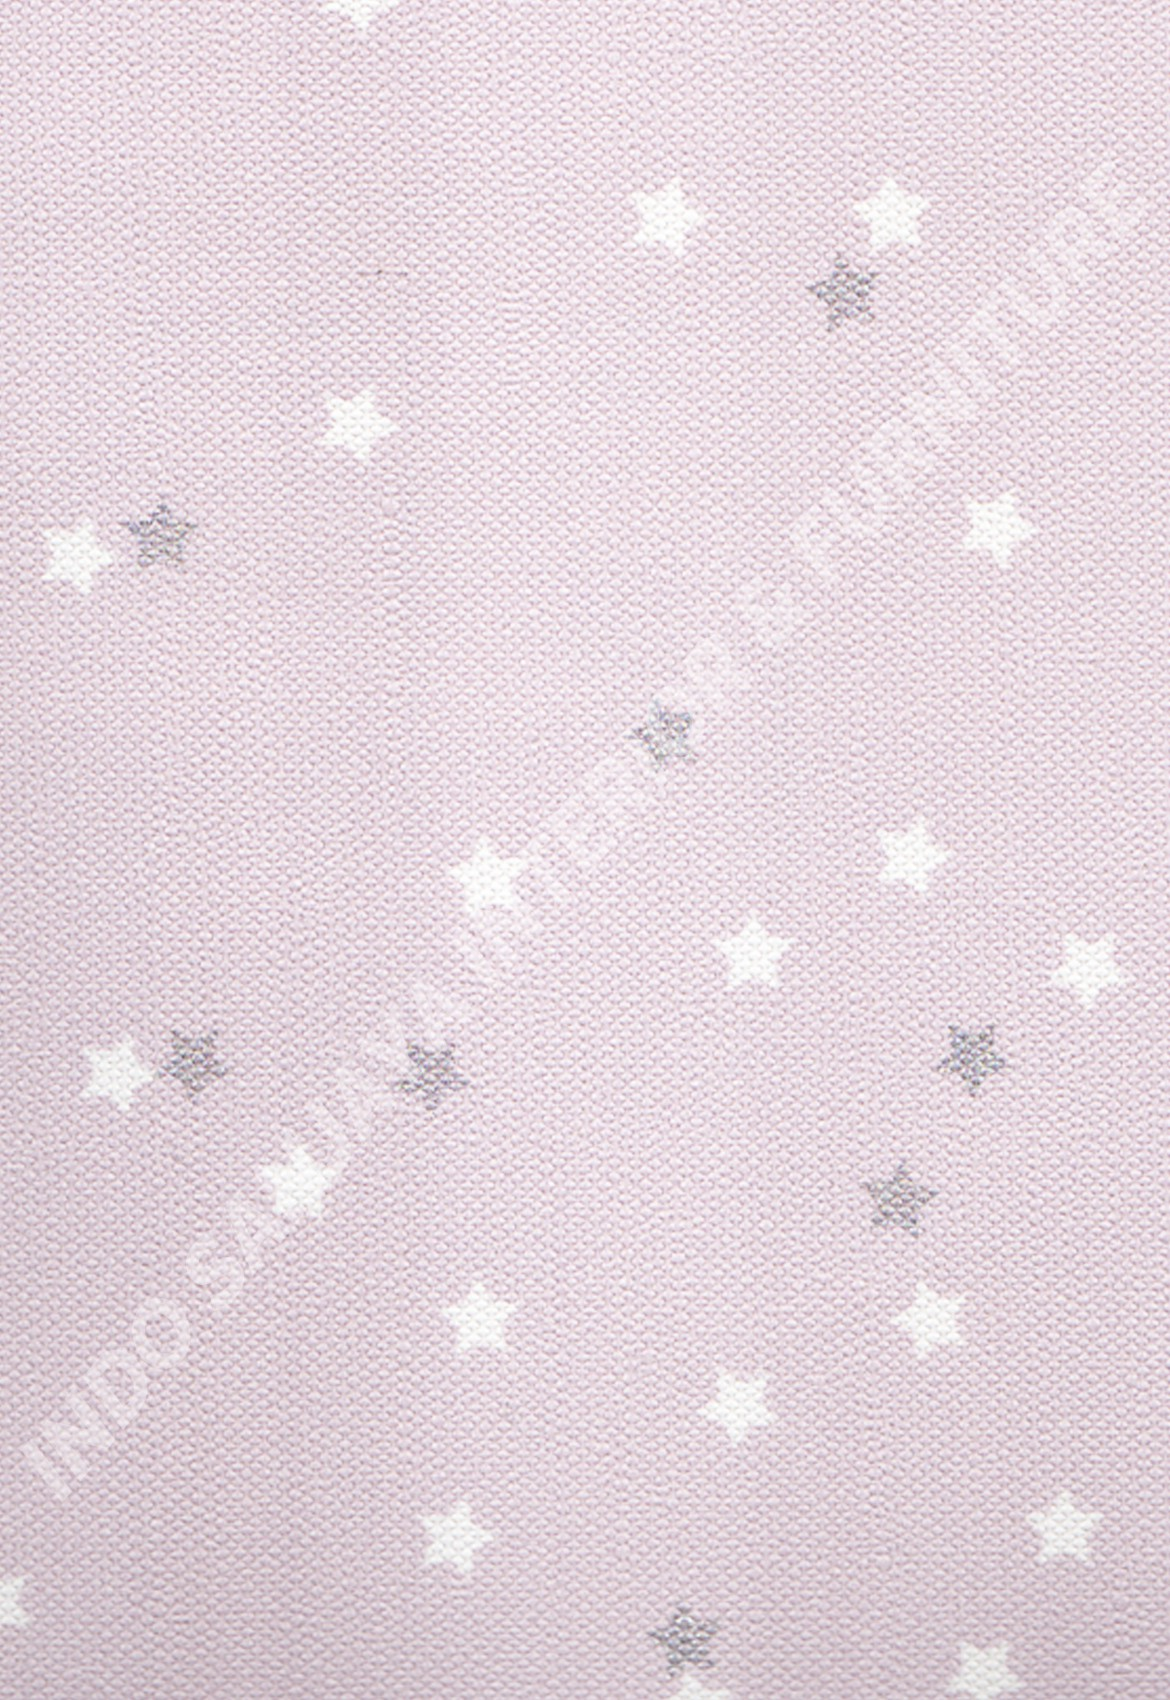 wallpaper   Wallpaper Minimalis Polos GK032-1:GK032-1 corak  warna